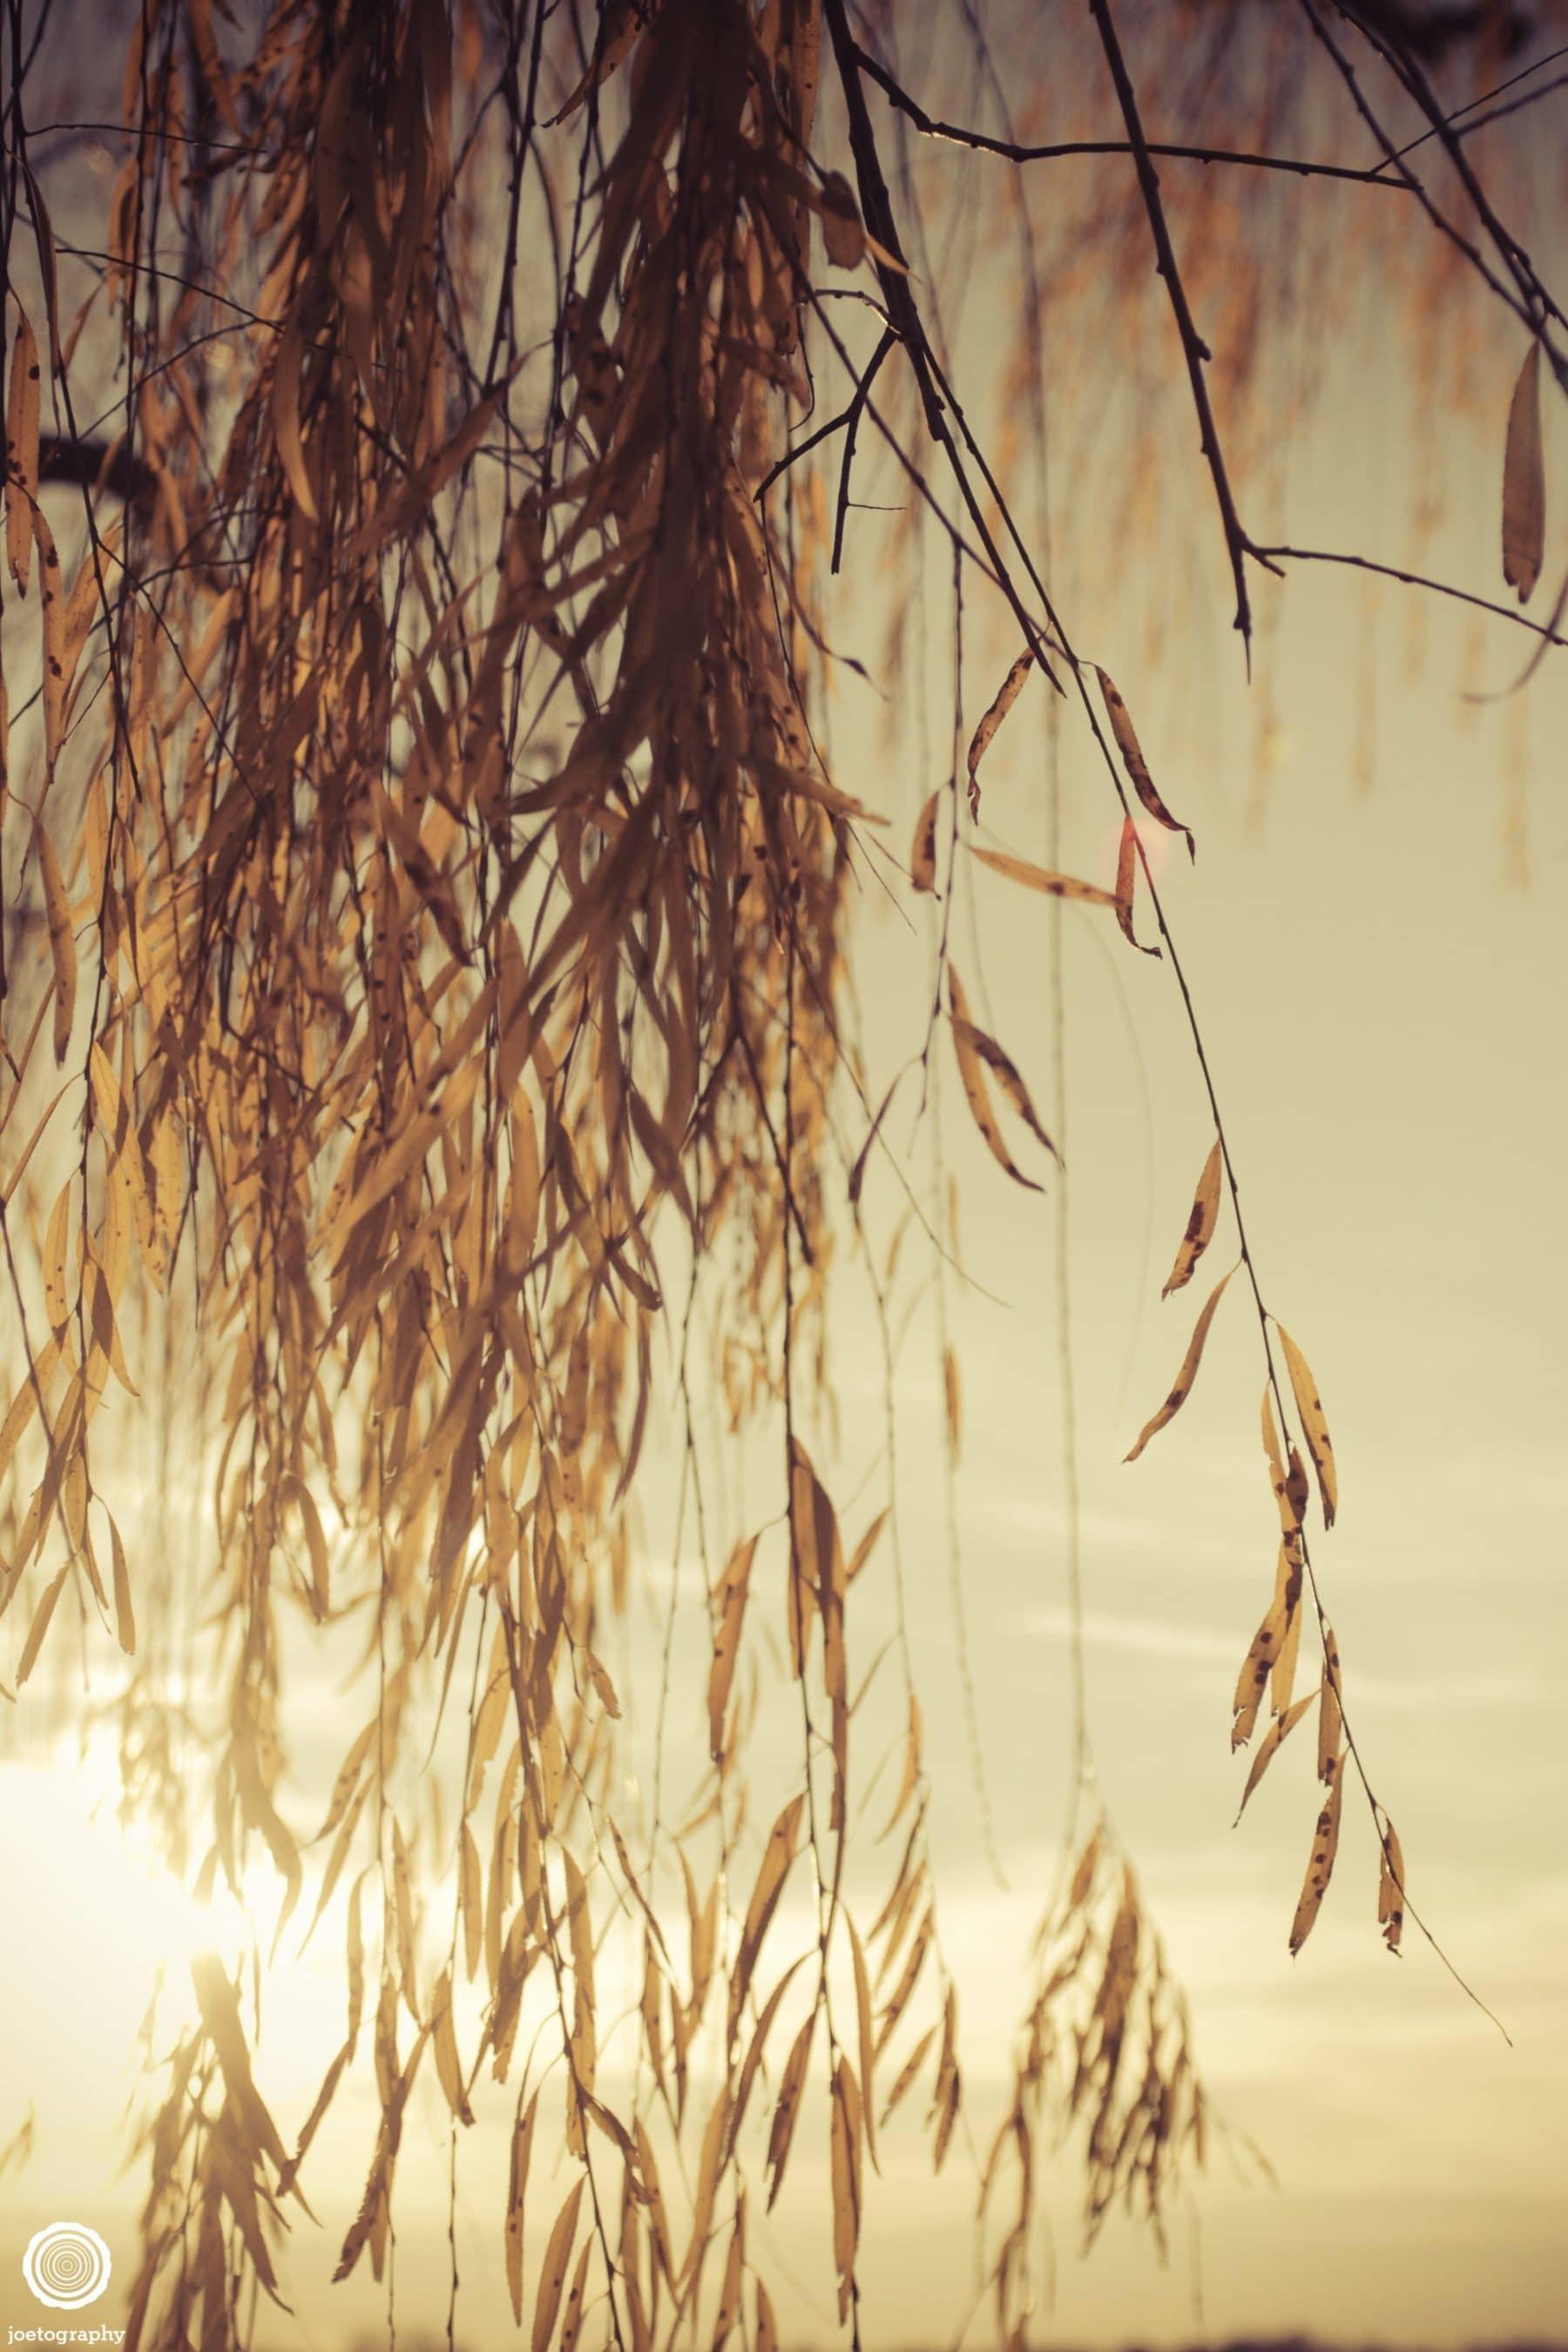 weeping-willow-nature-photography-washington-dc-4